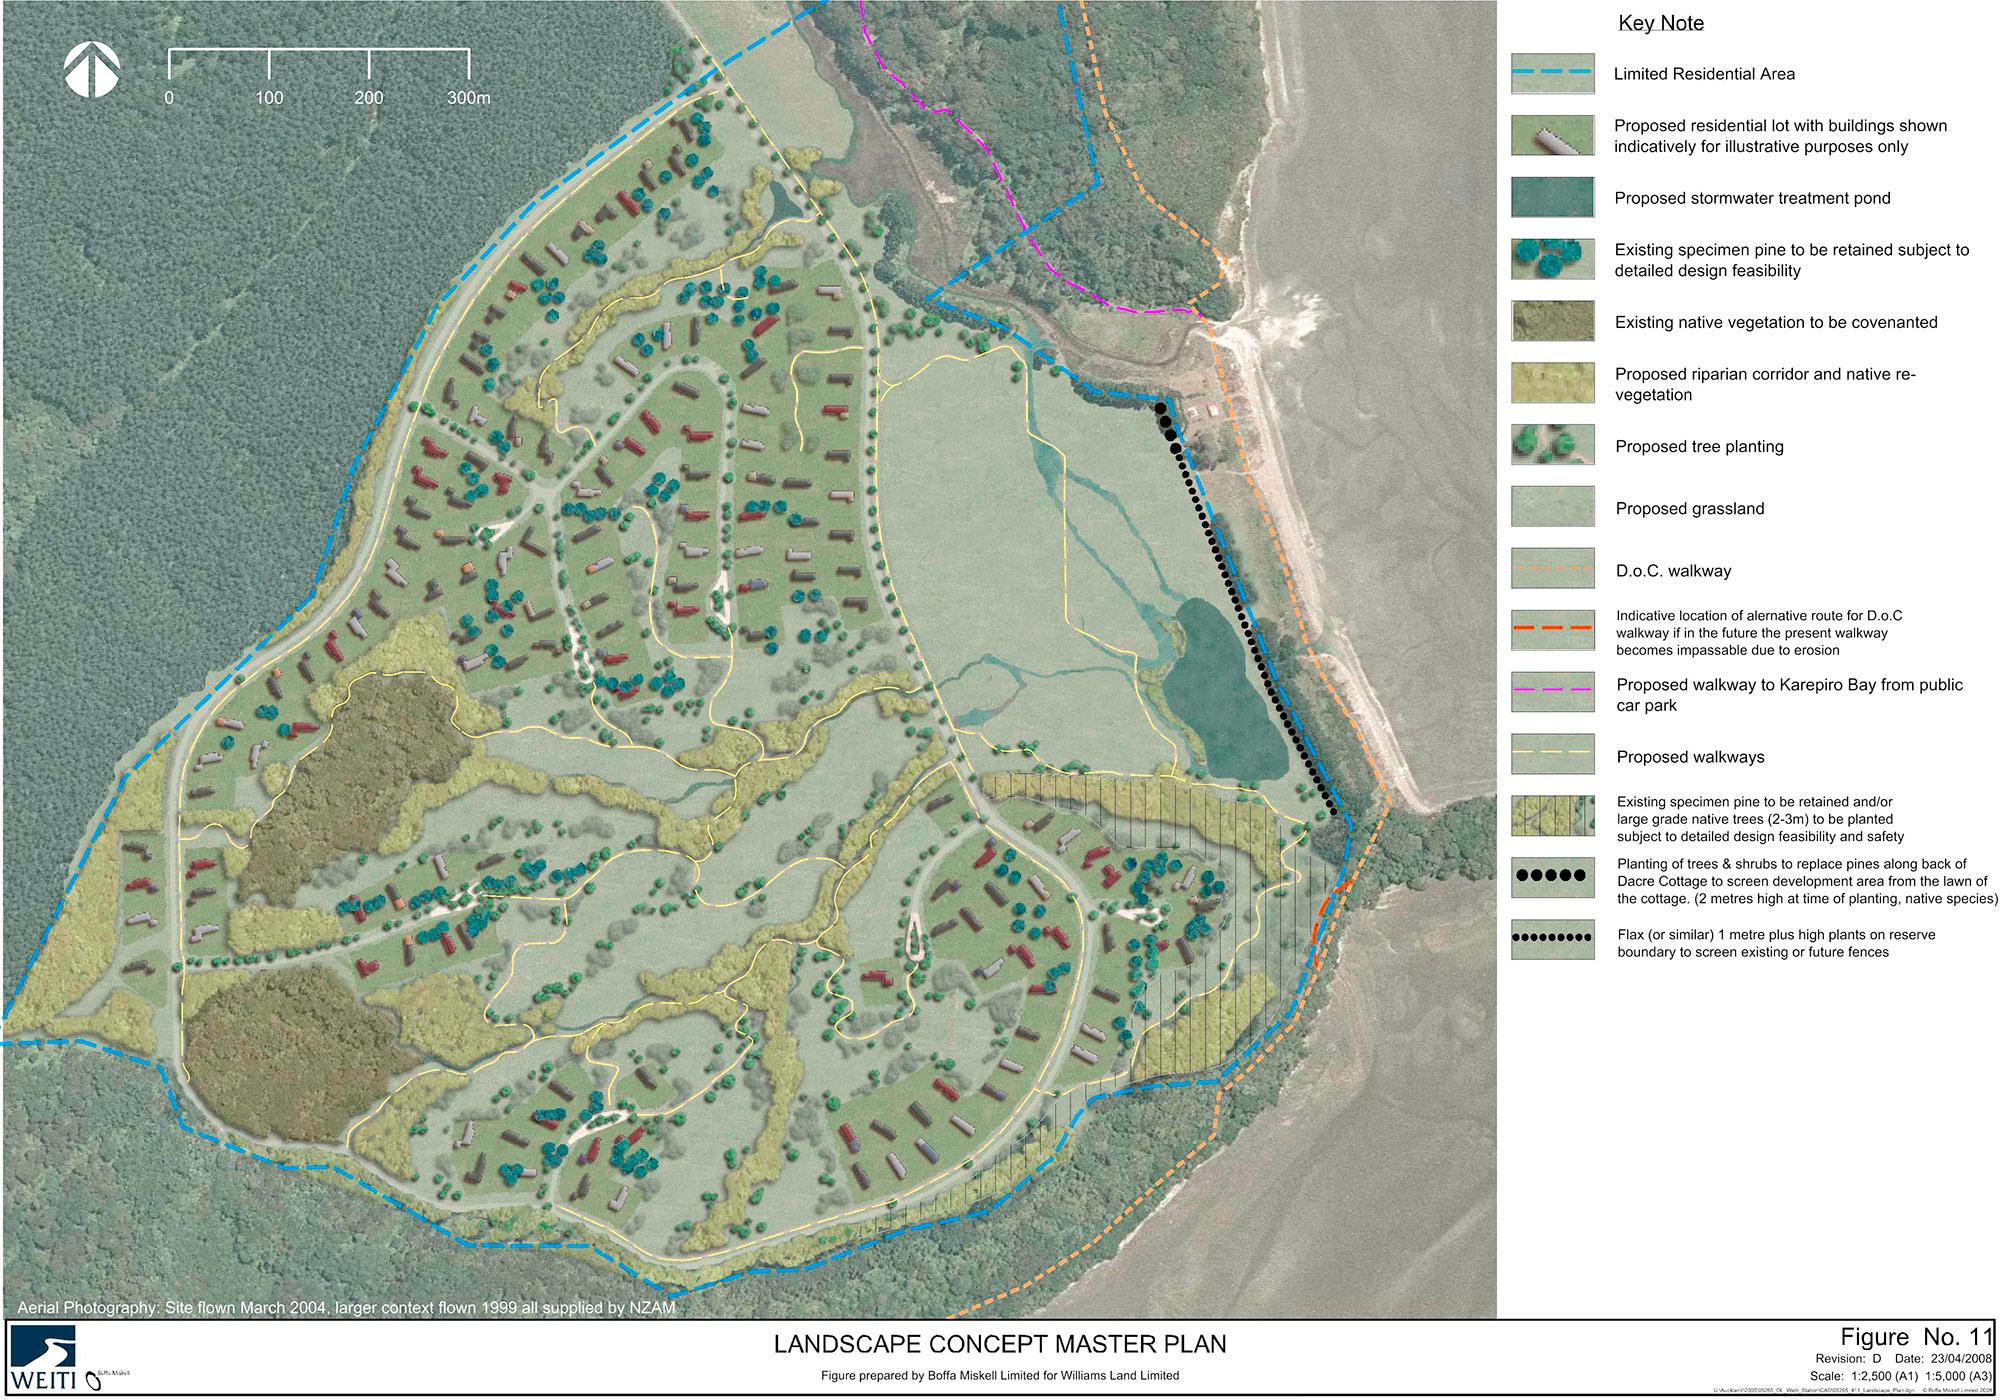 Landscape Concept Master Plan